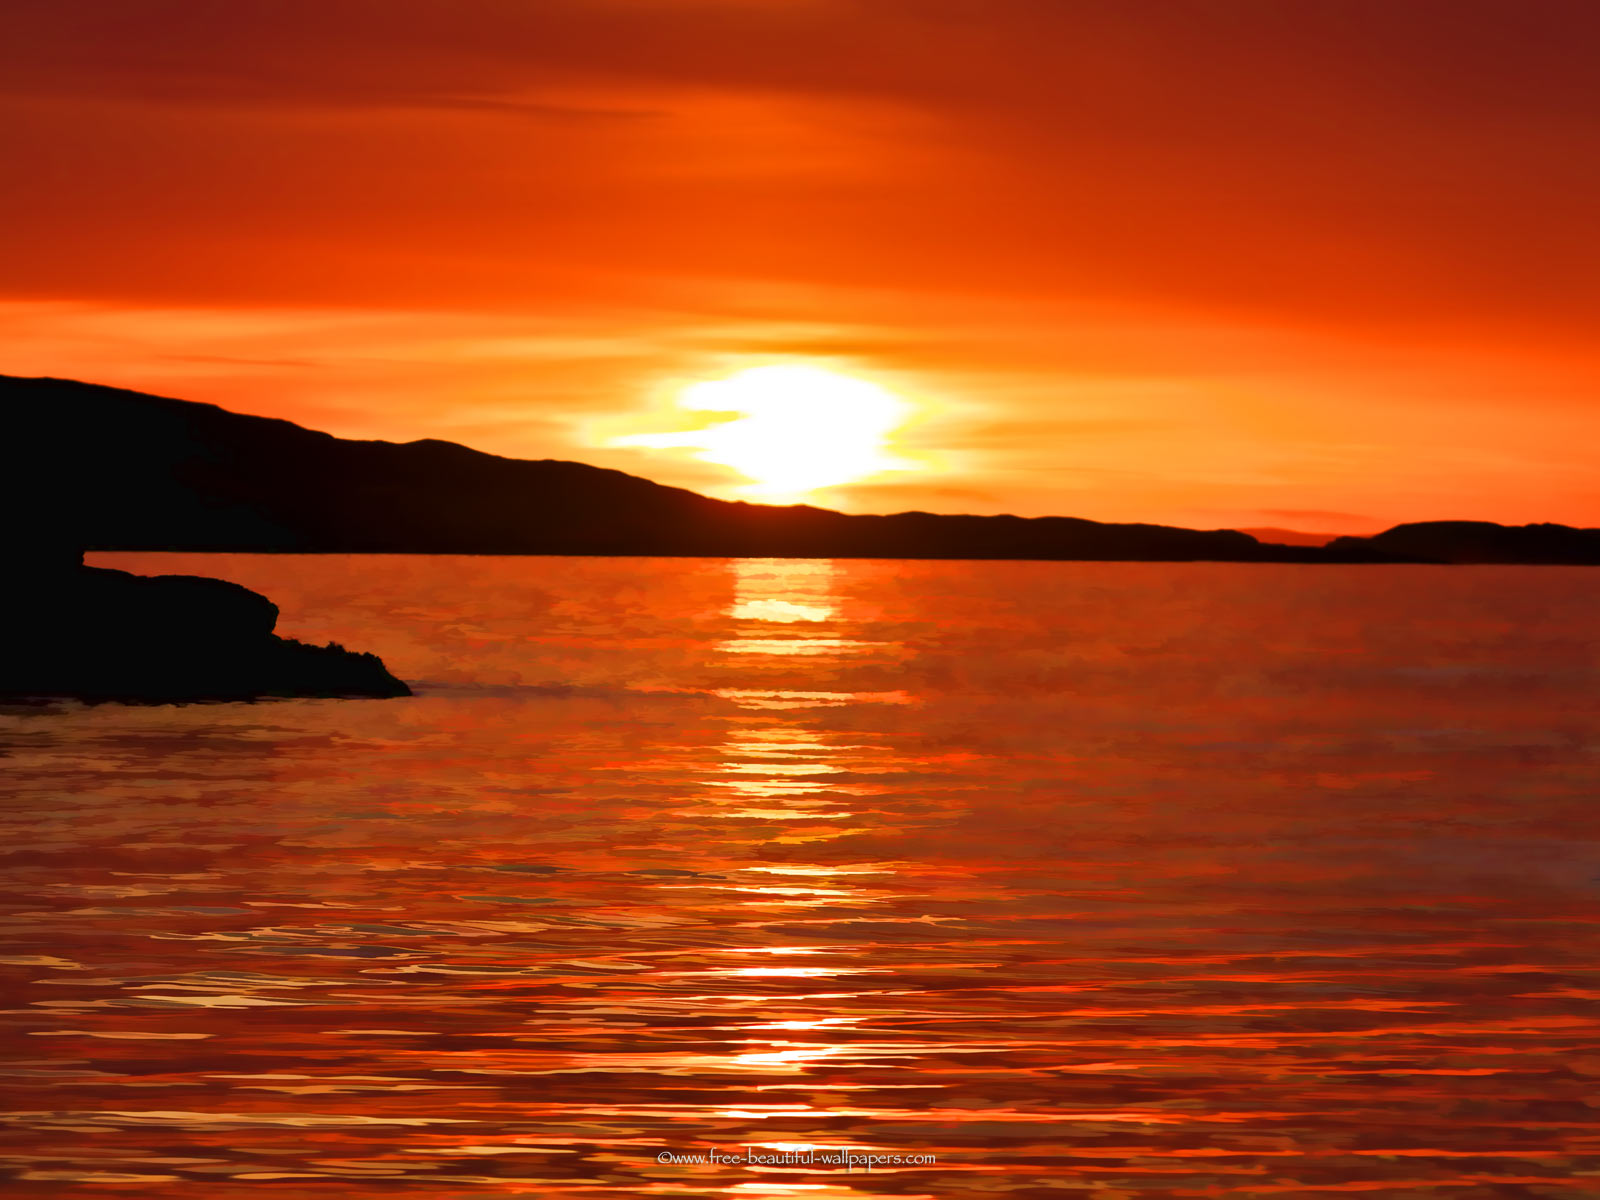 sunset ocean wallpaper - sf wallpaper